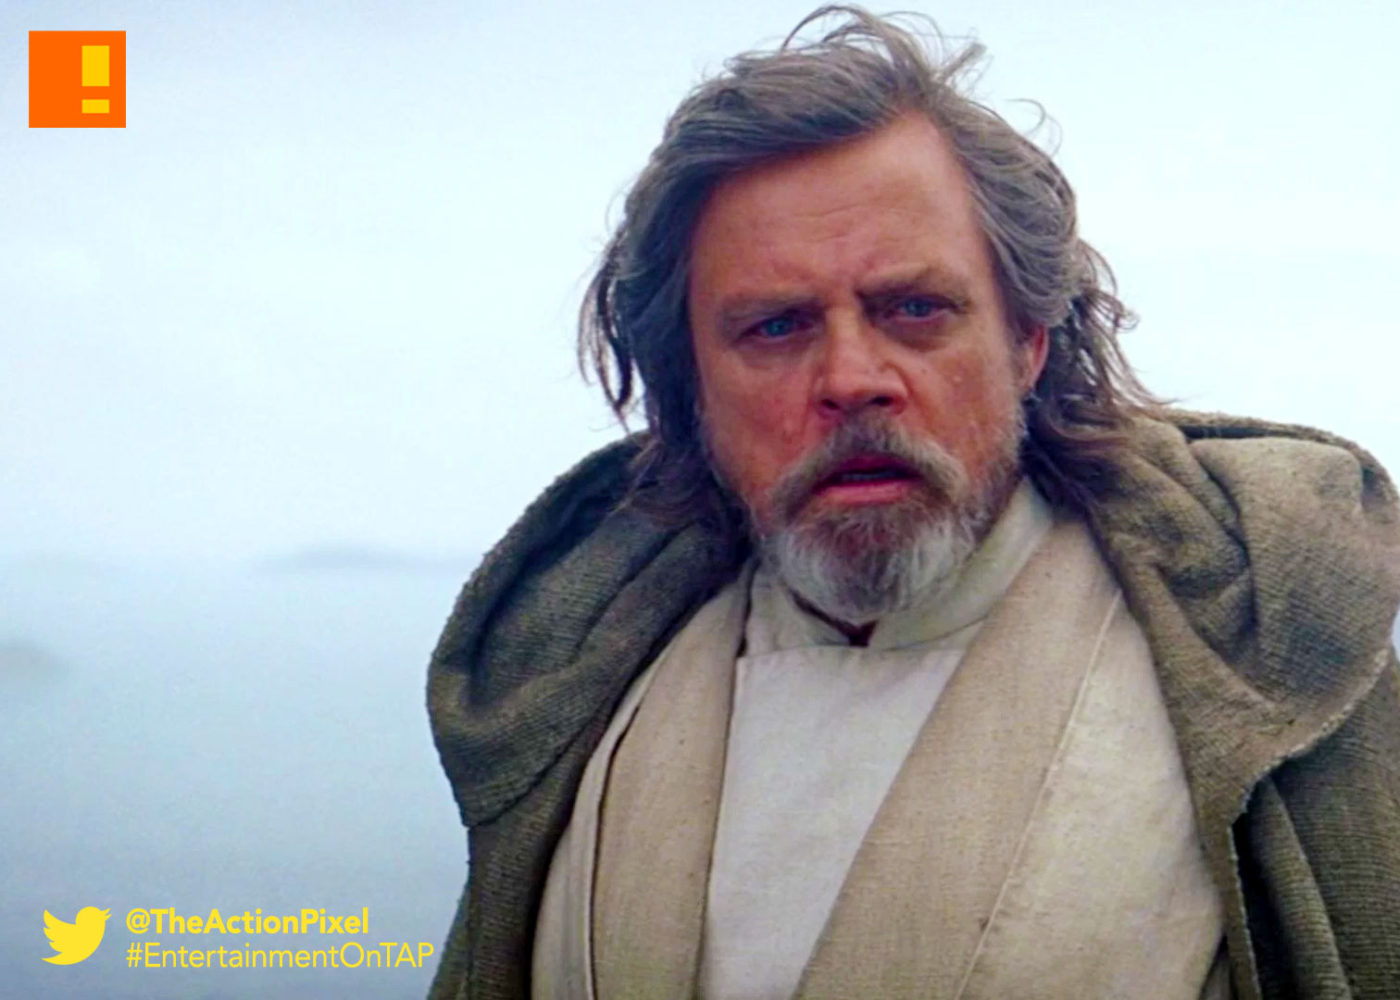 luke skywalker, the force awakens, star wars, disney,